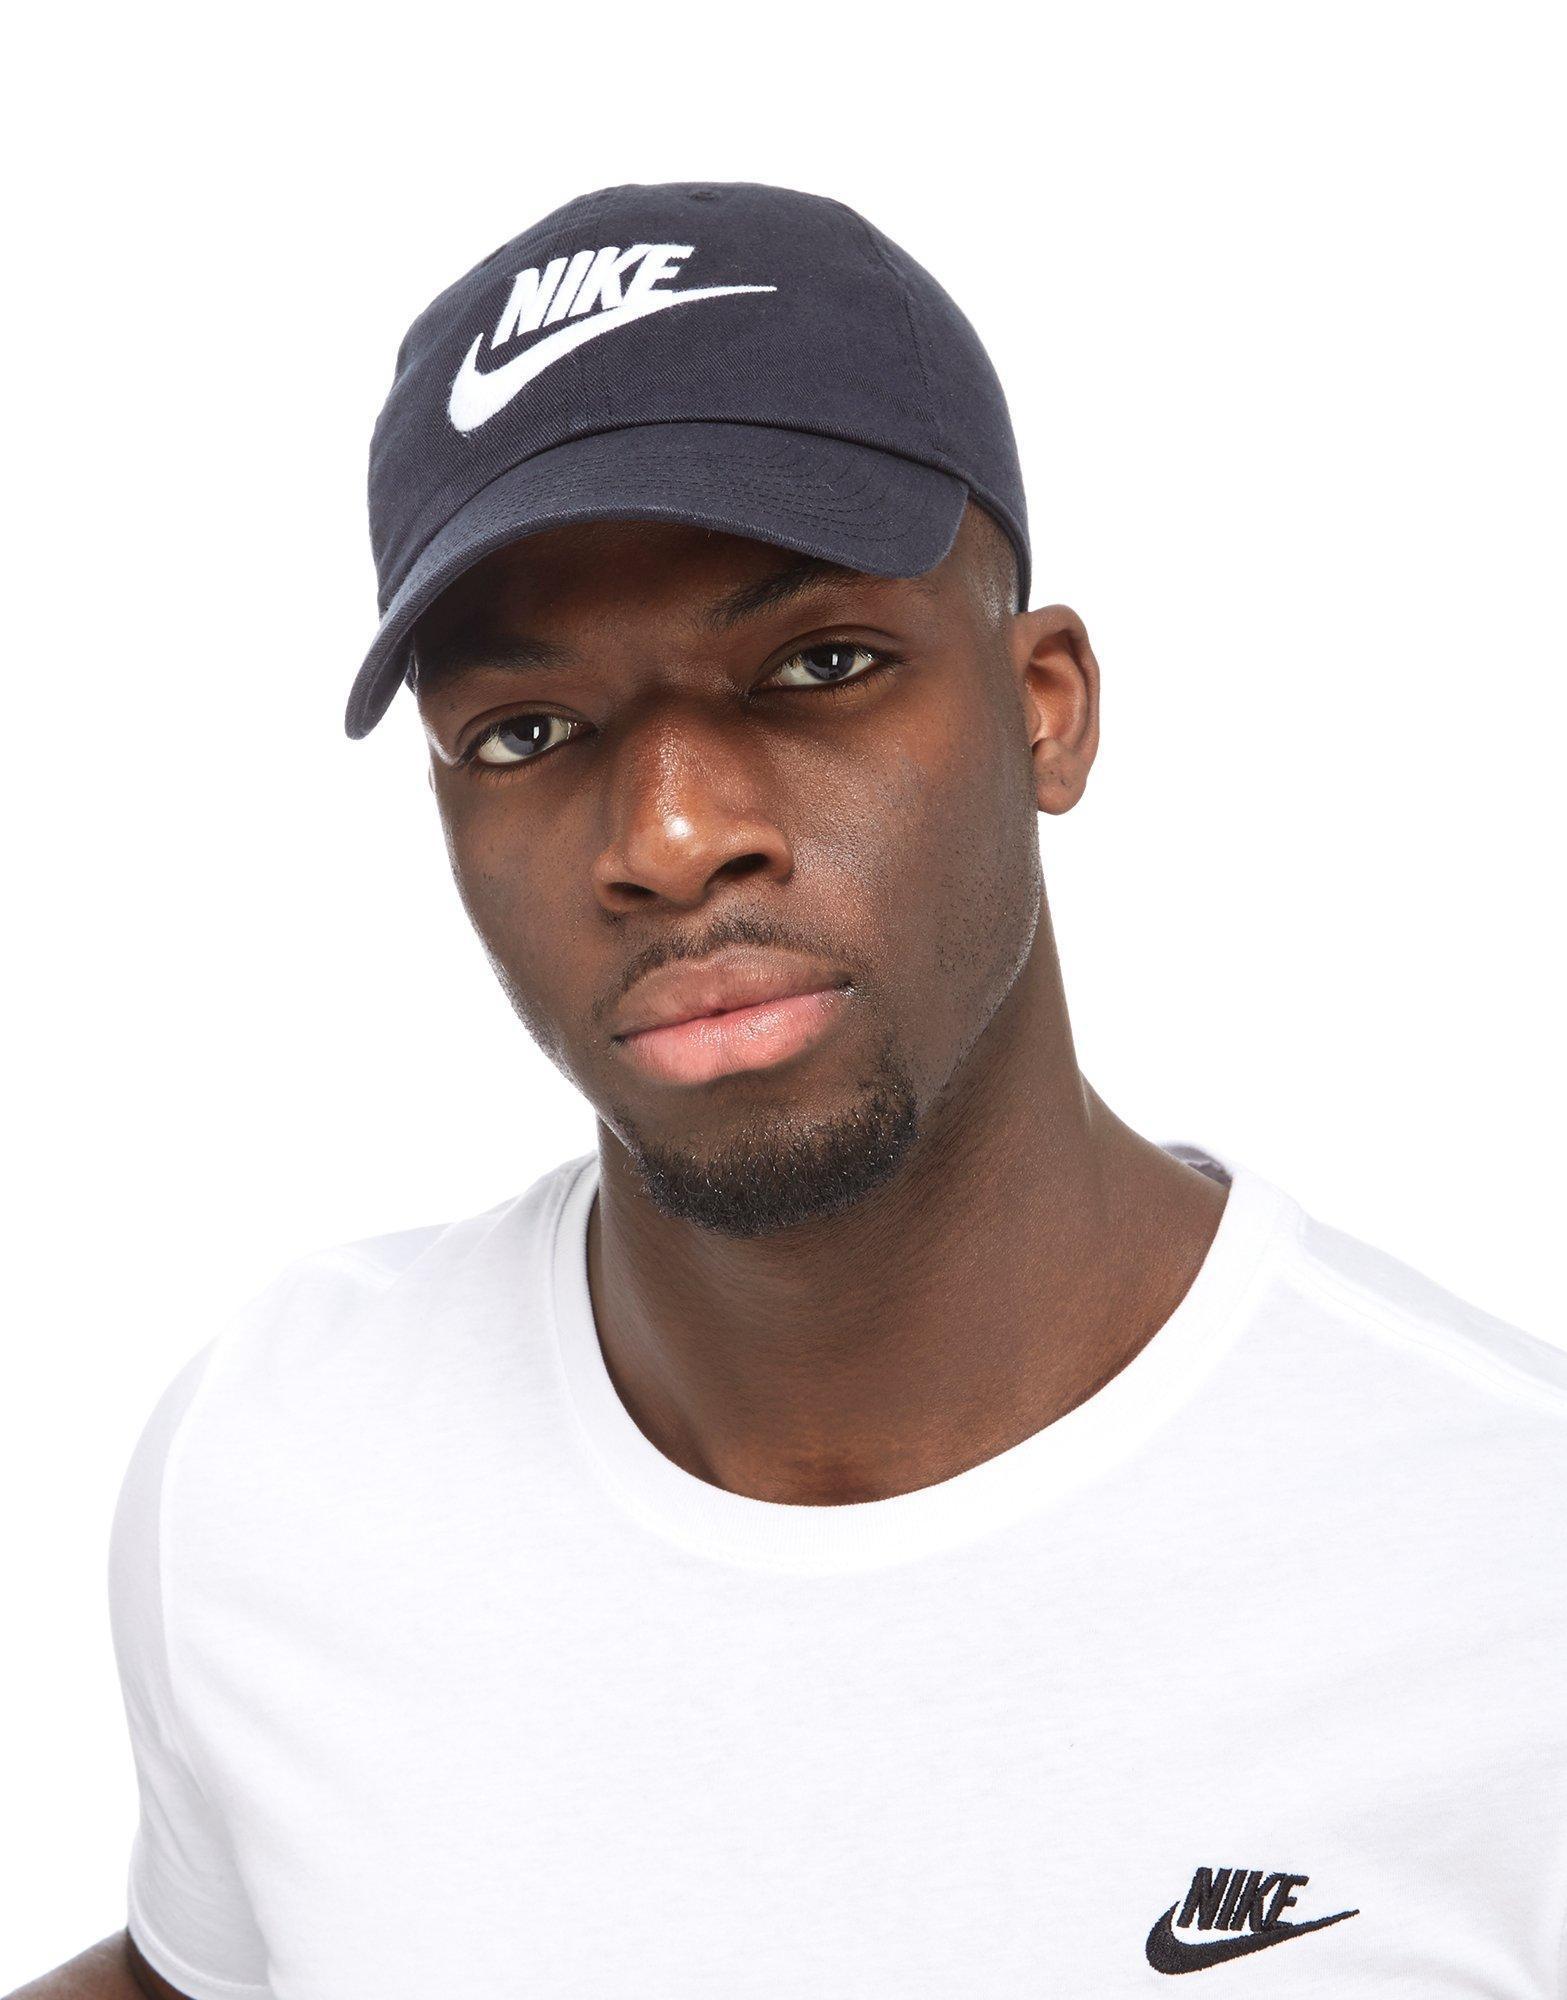 Lyst - Nike Futura Washed Strapback Cap in Black for Men 1ac2c4860f6